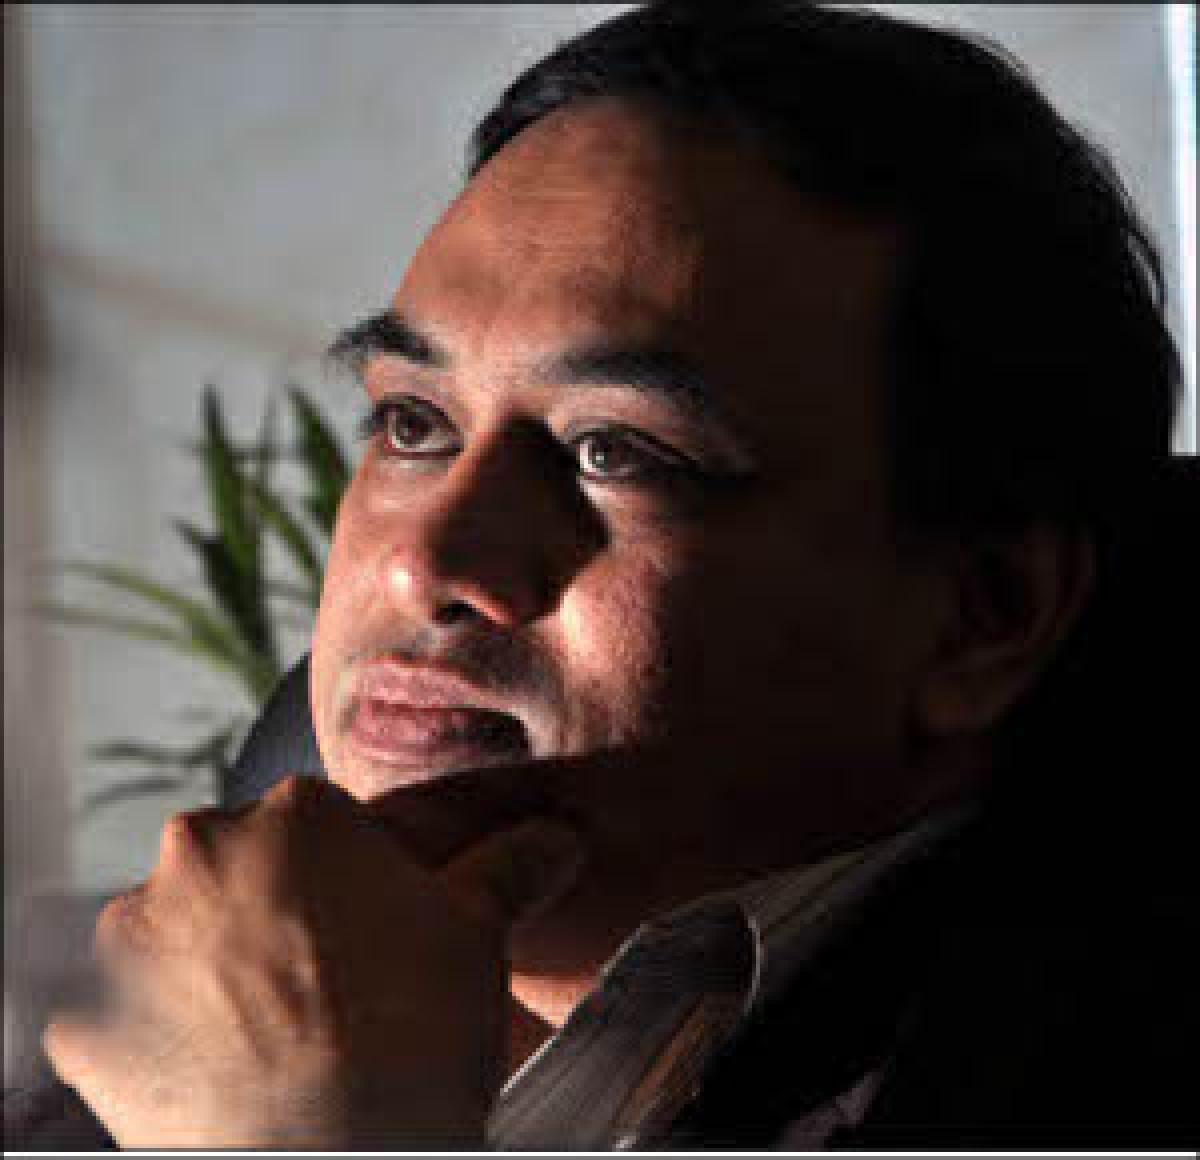 Chrome Data Analytics & Media appoints Ashok Venkatramani as director